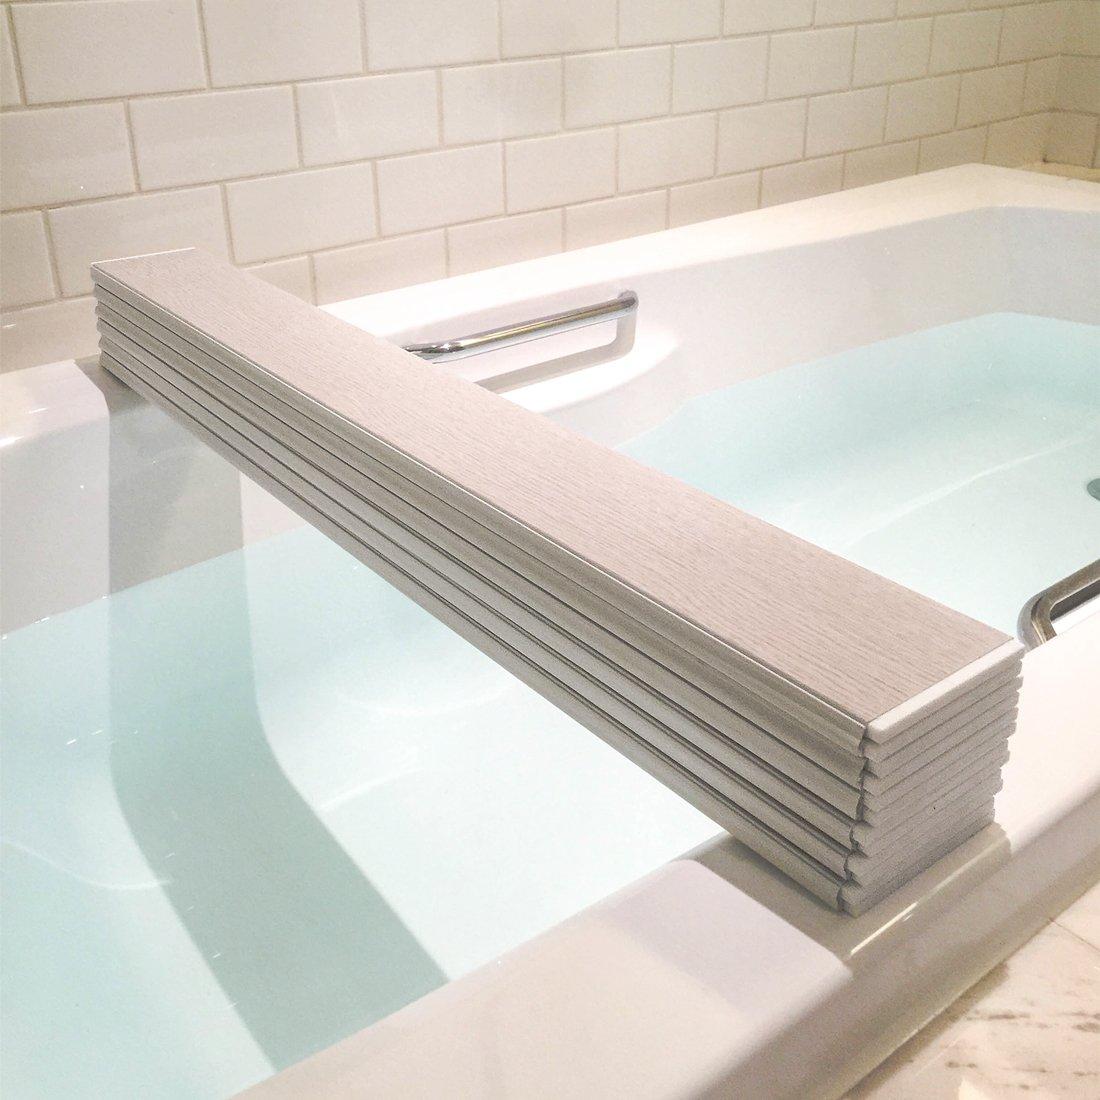 Mia home Folding Bathtub Tray, Good for Keeping Water Hot, Foldable ...